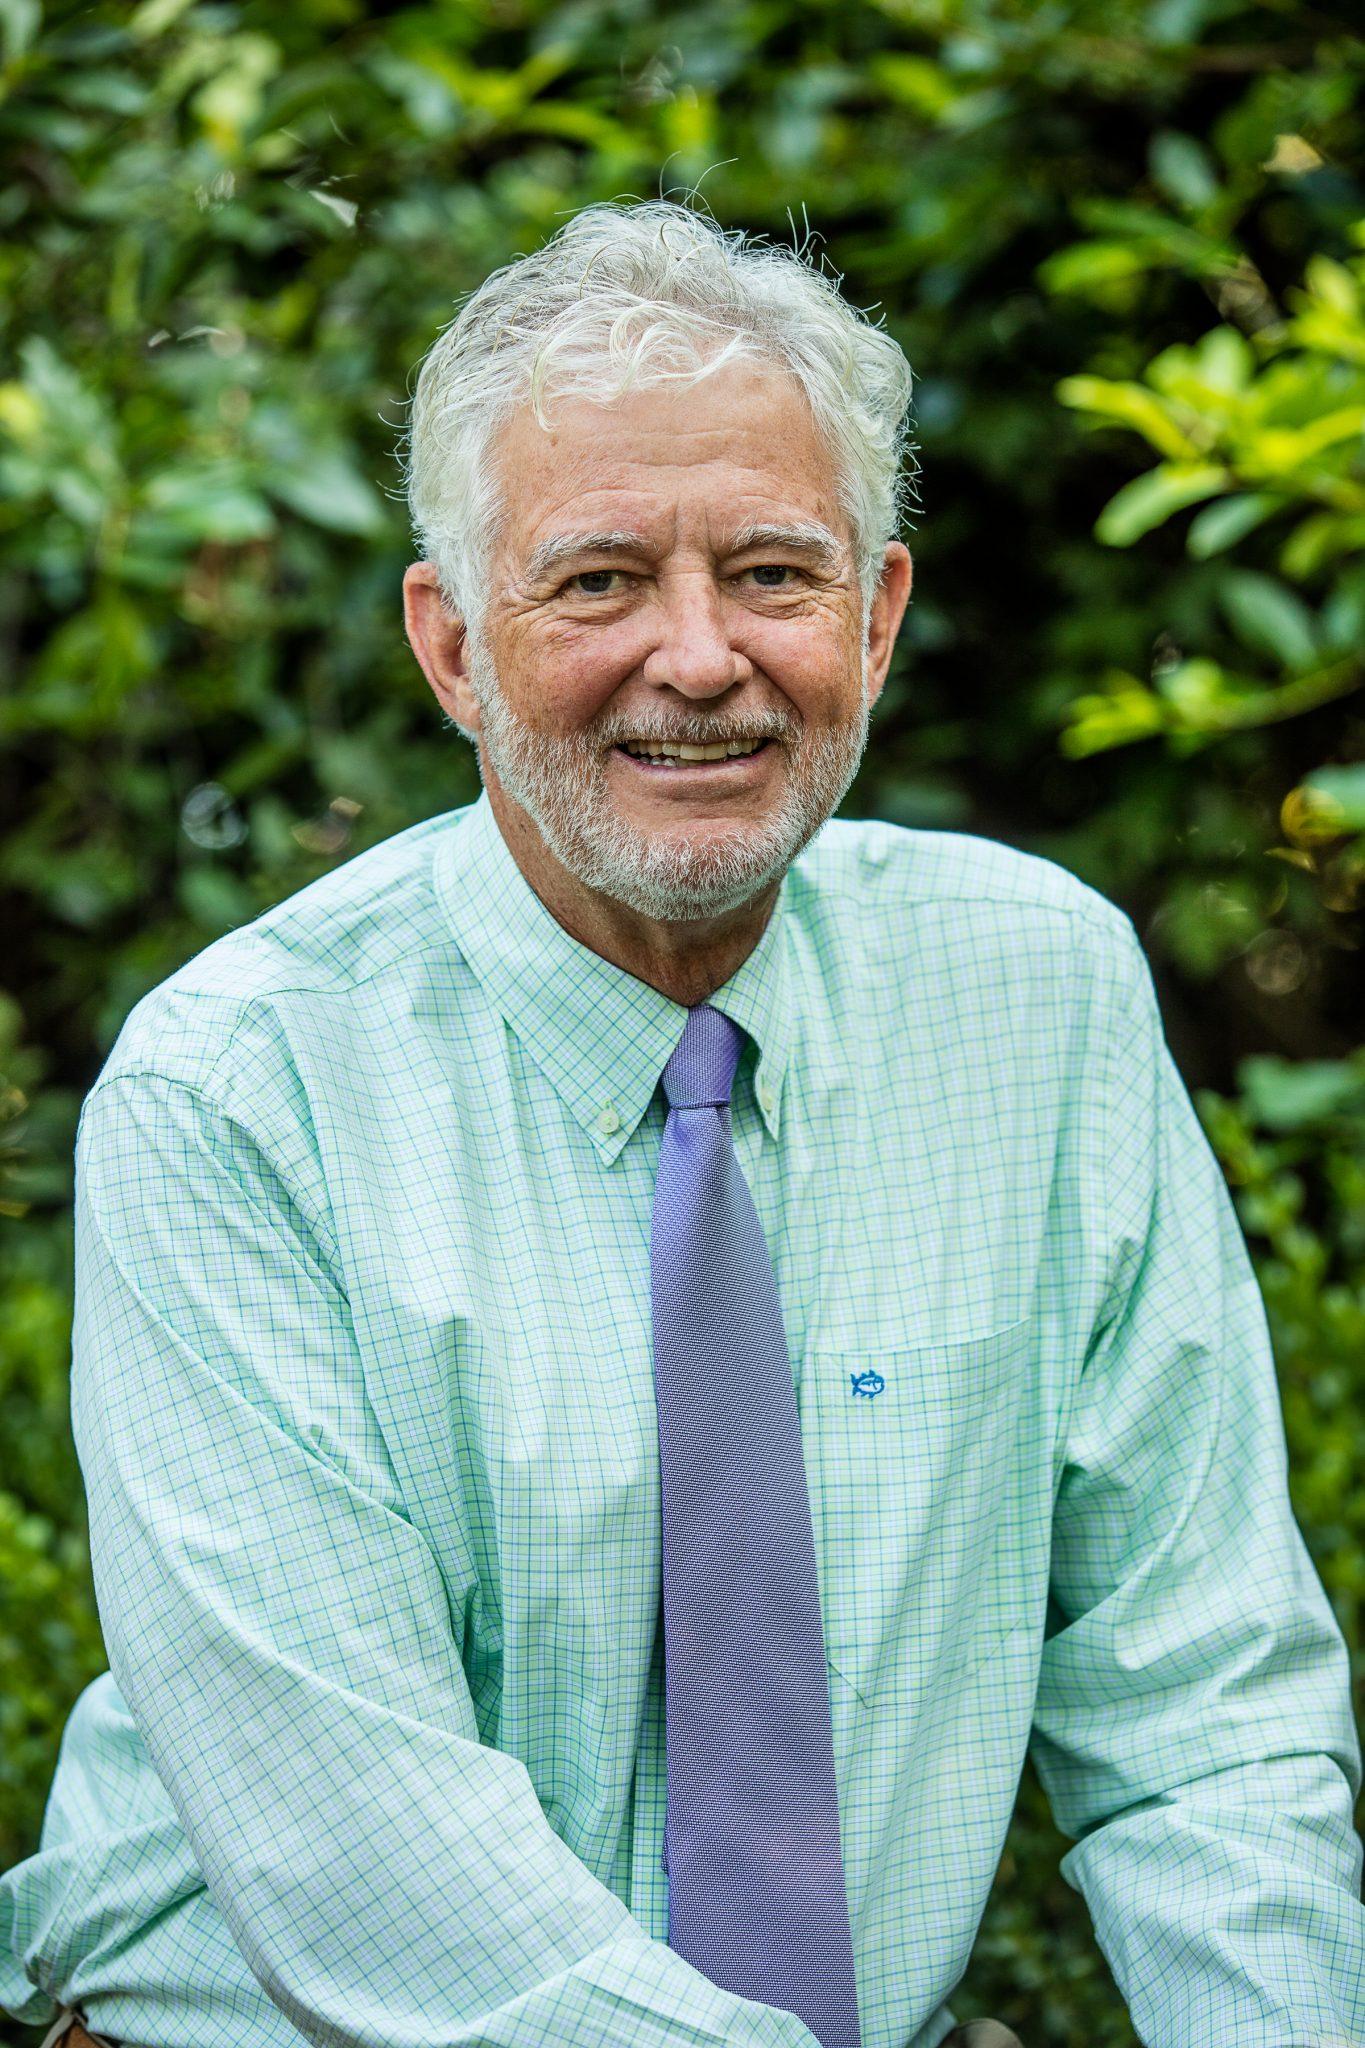 Dr. Eyman, Central Georgia Periodontics & Dental Implants